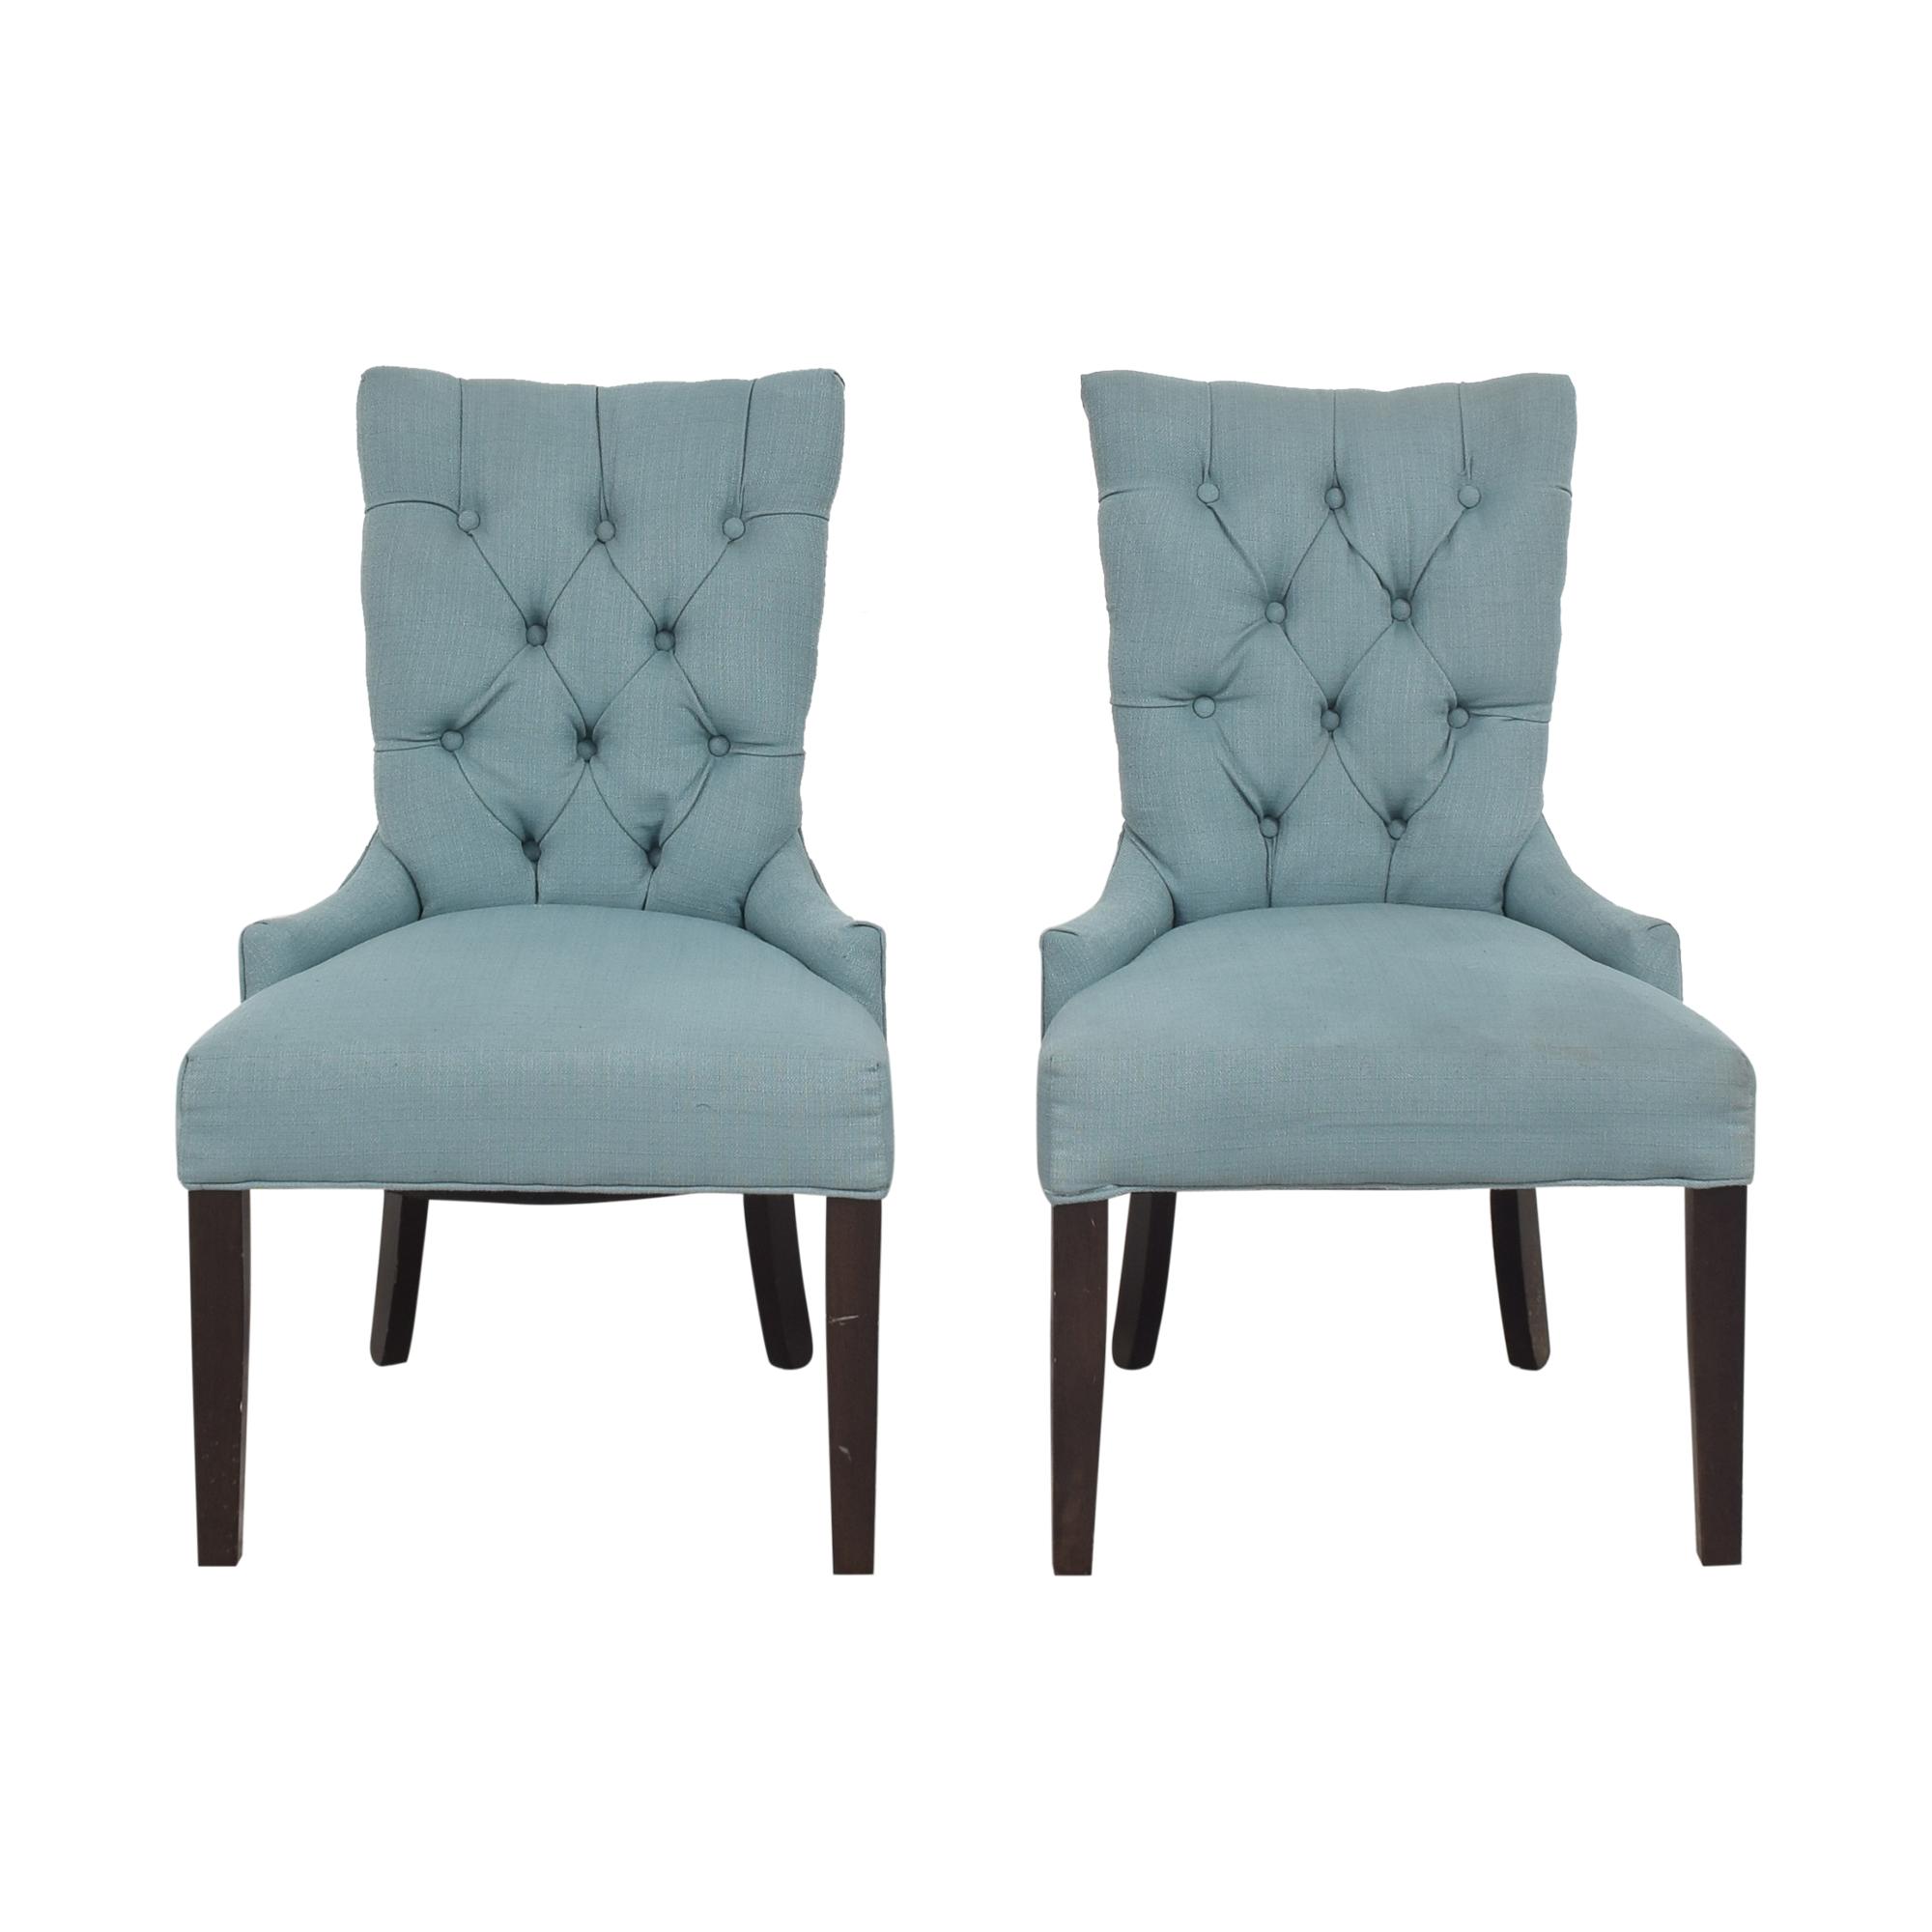 shop Safavieh Abby Tufted Nailhead Chairs Safavieh